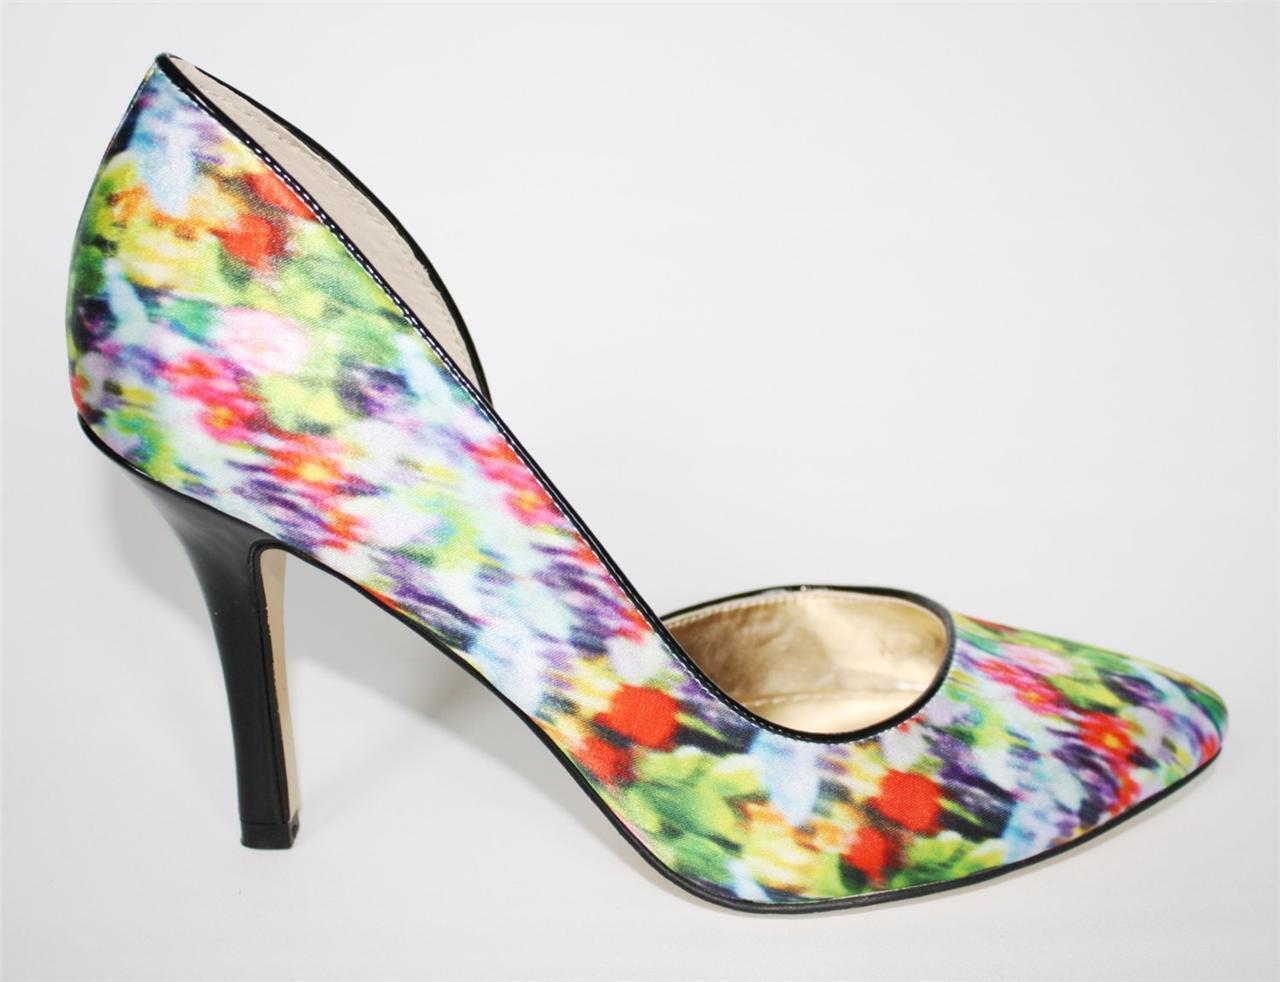 Damenschuhe Schuhes Anne Klein ZYA d'Orsay Classy Satin Pumps Heels Green Multi Satin Classy Fabric 0b08d6